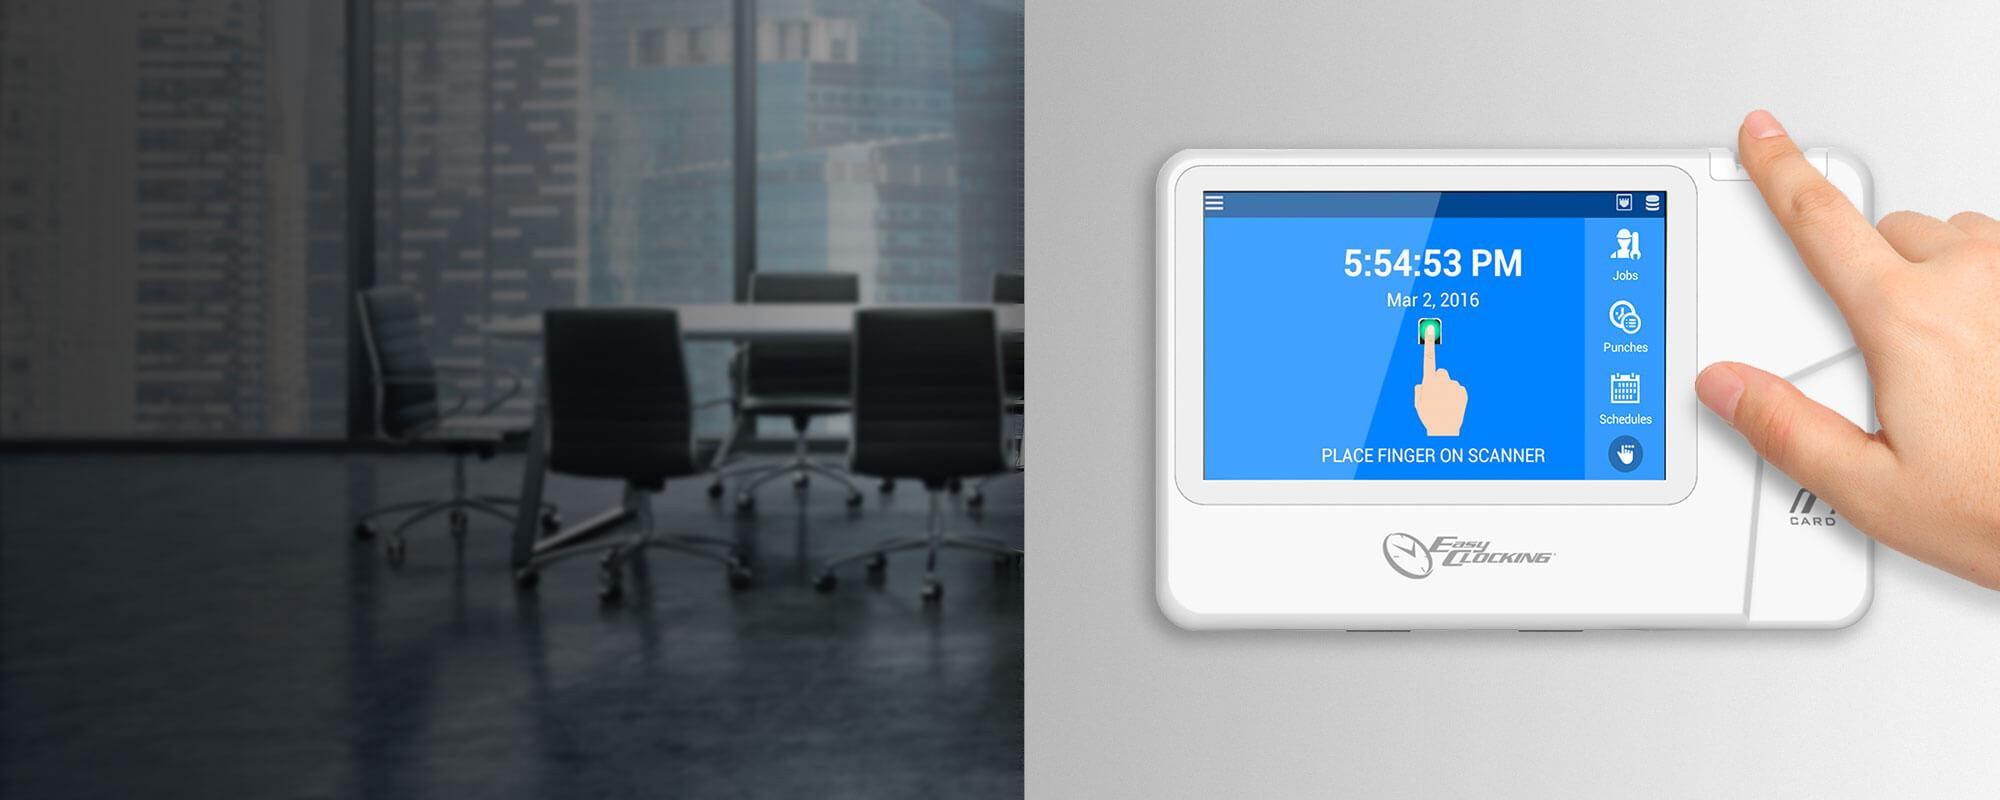 EasyClocking | Time & Attendance - Employee Time Clocks